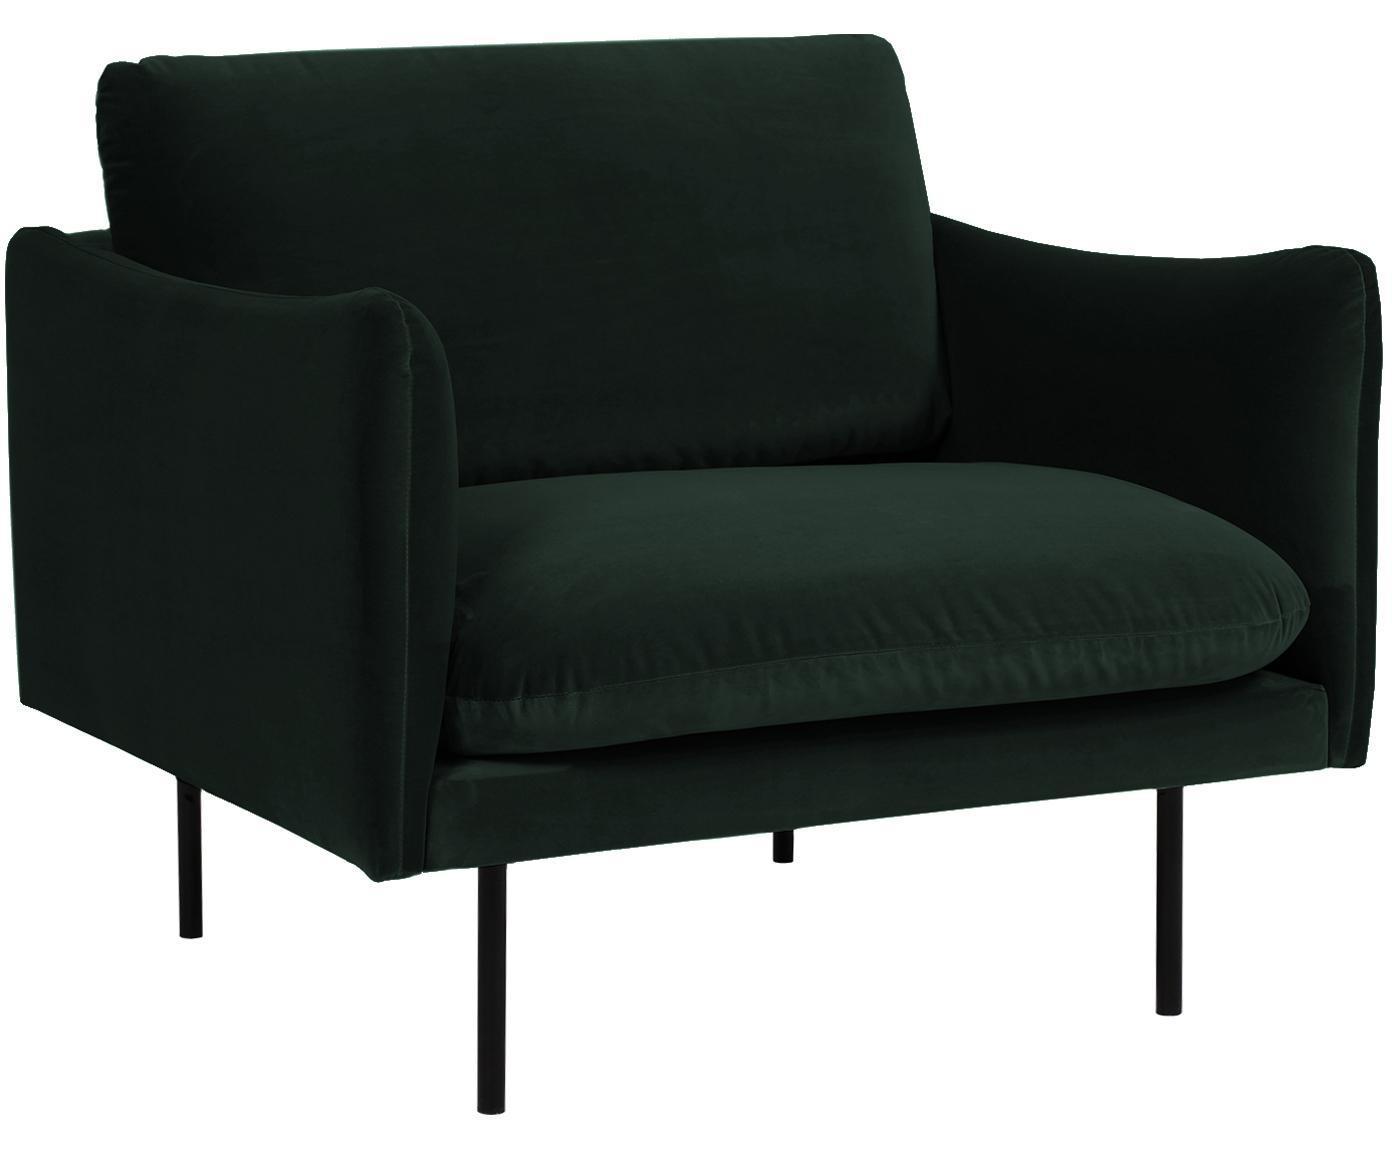 Fluwelen fauteuil Moby, Bekleding: fluweel (hoogwaardige pol, Frame: massief grenenhout, Poten: gepoedercoat metaal, Donkergroen, B 90 x D 90 cm